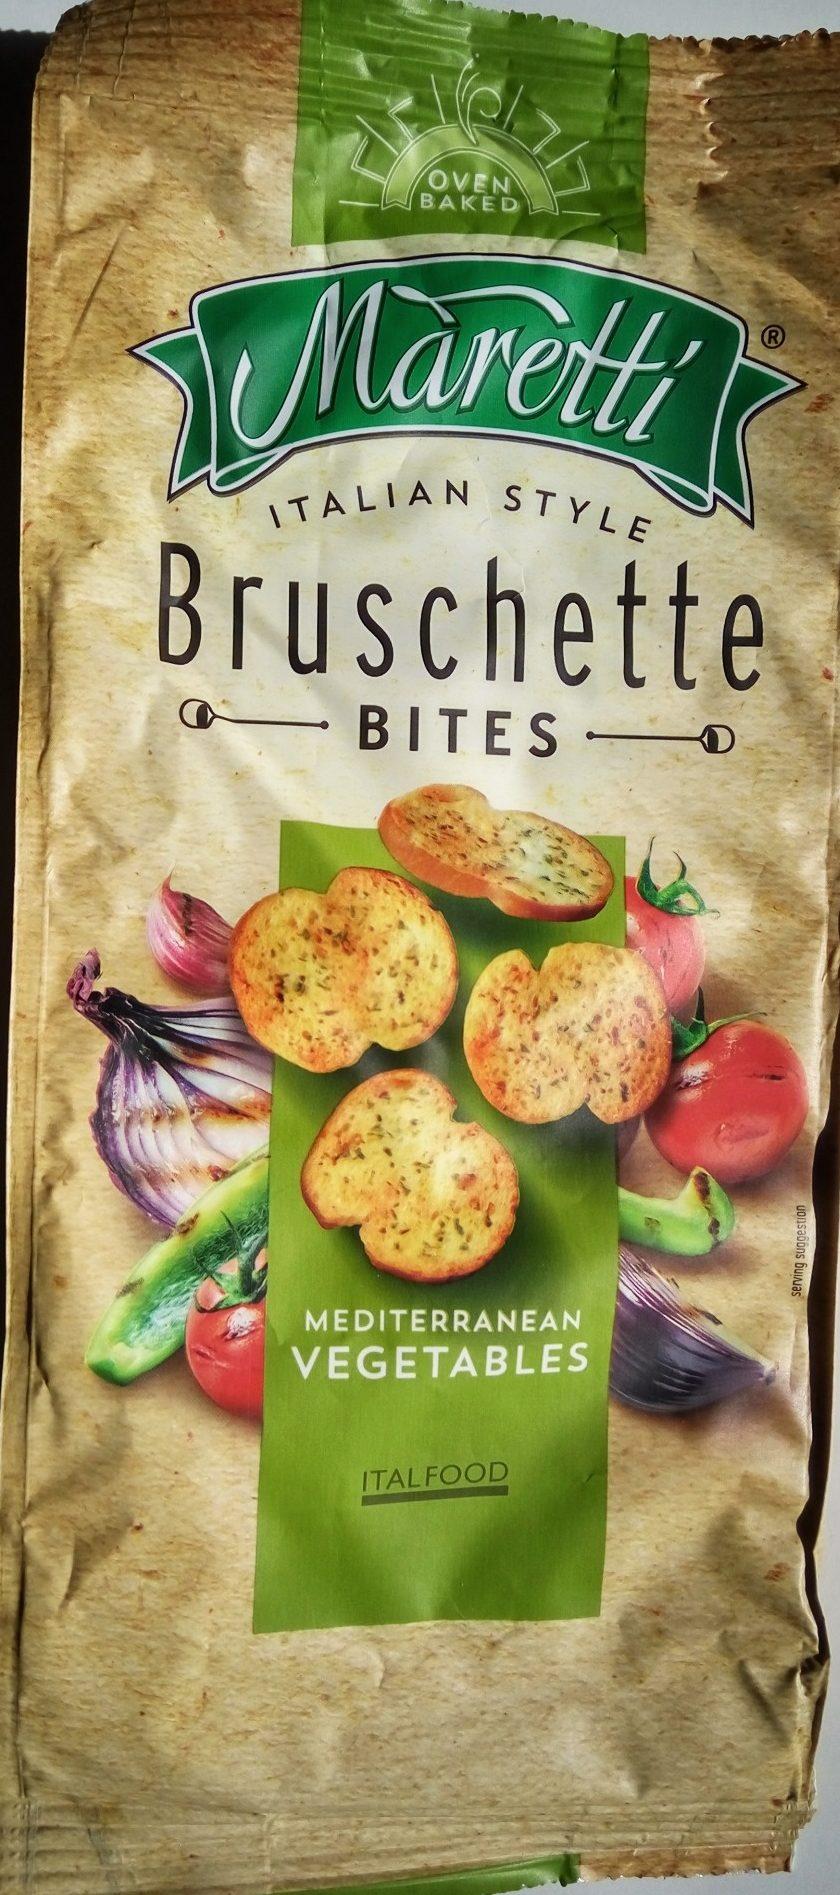 Bruschette bites Mediterranean vegetables - Produit - sr